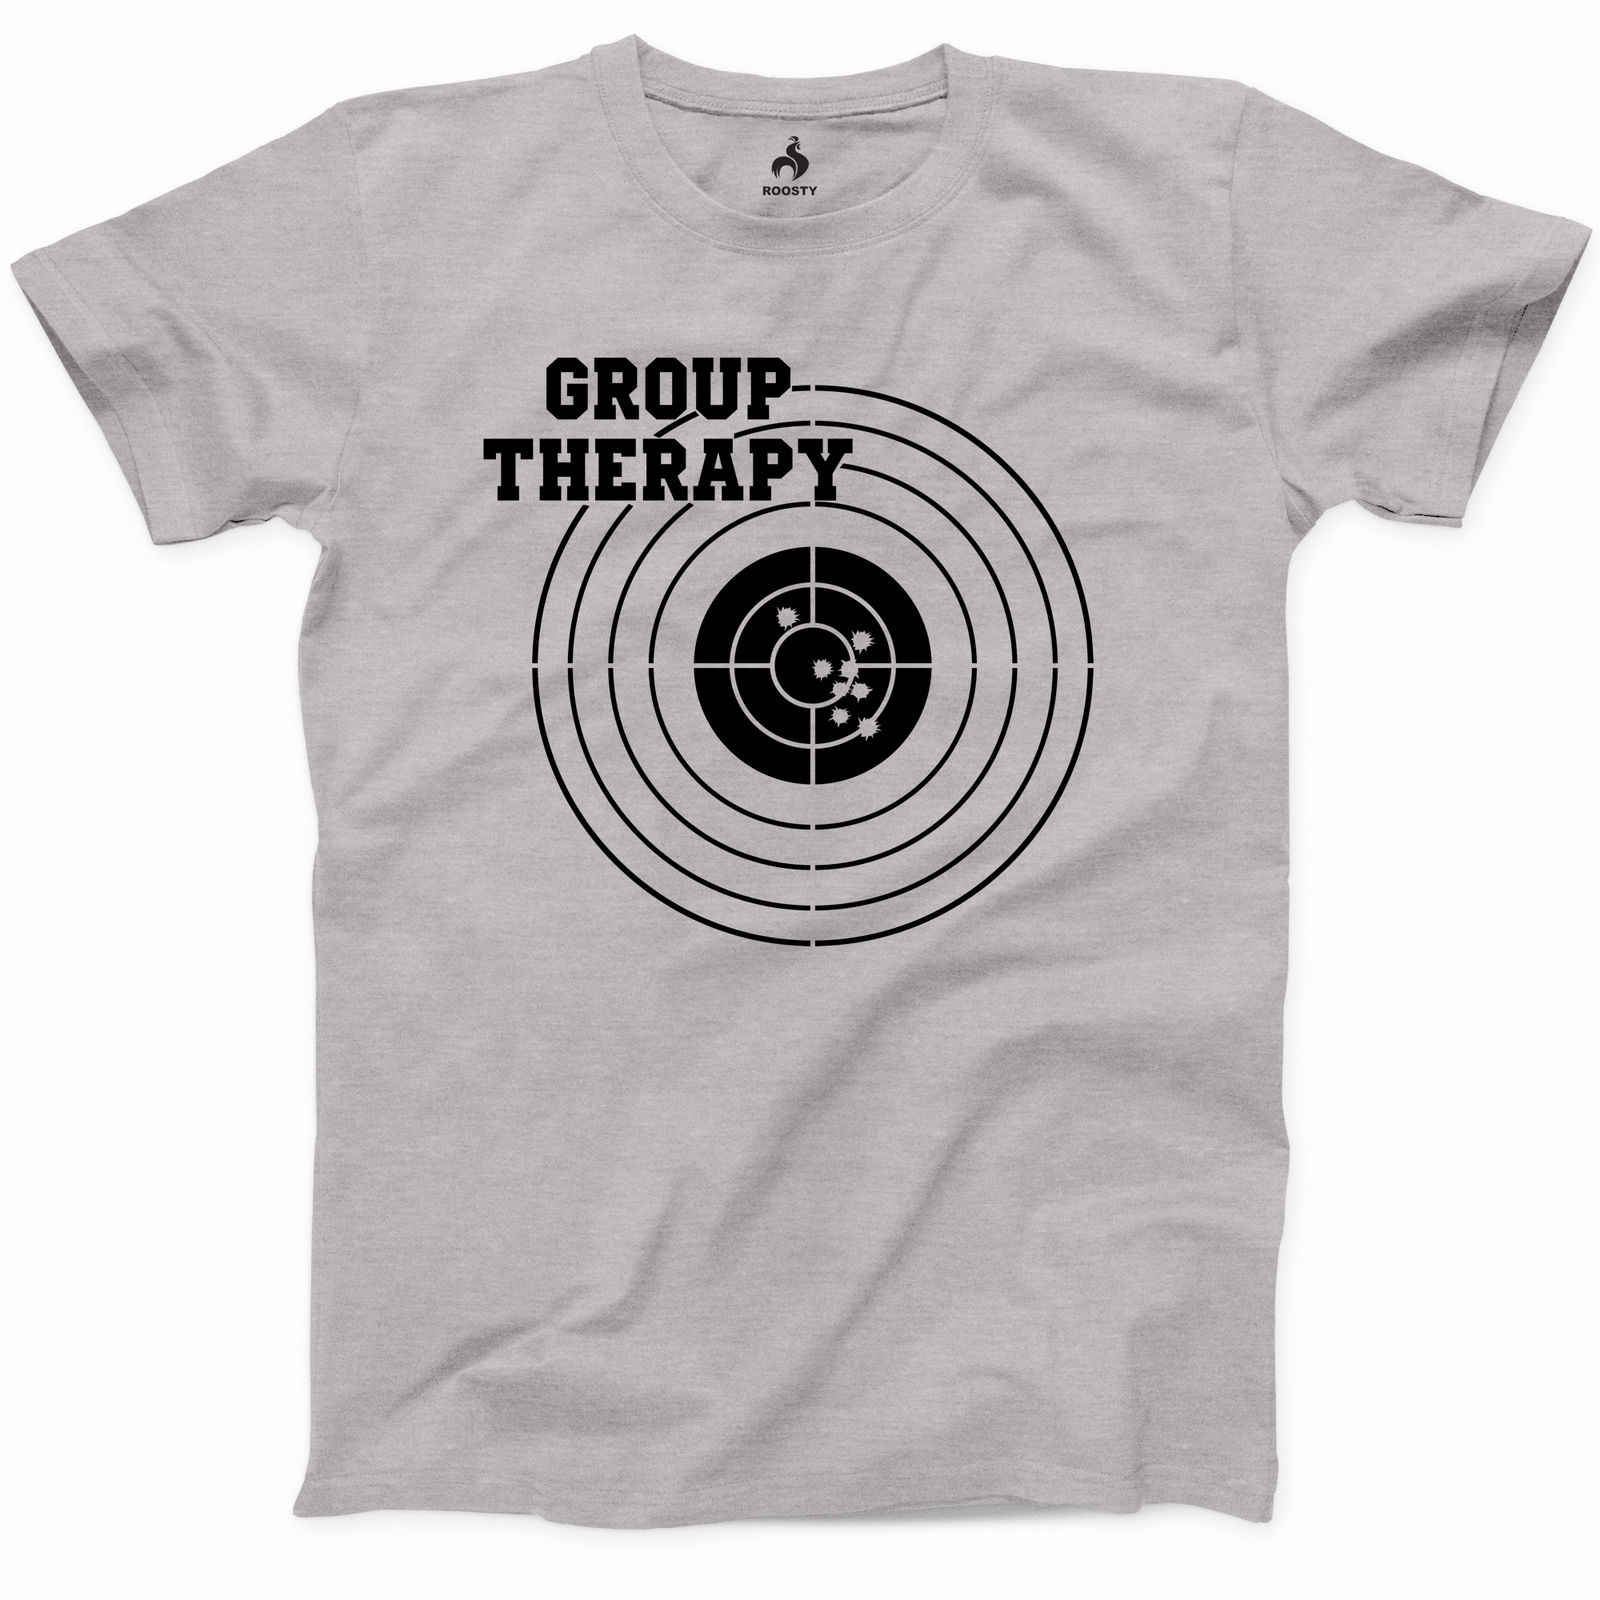 e733bf3dc Group Therapy Shooting T Shirt Funny Gun Laws Rights American 2nd Amendment  Tee